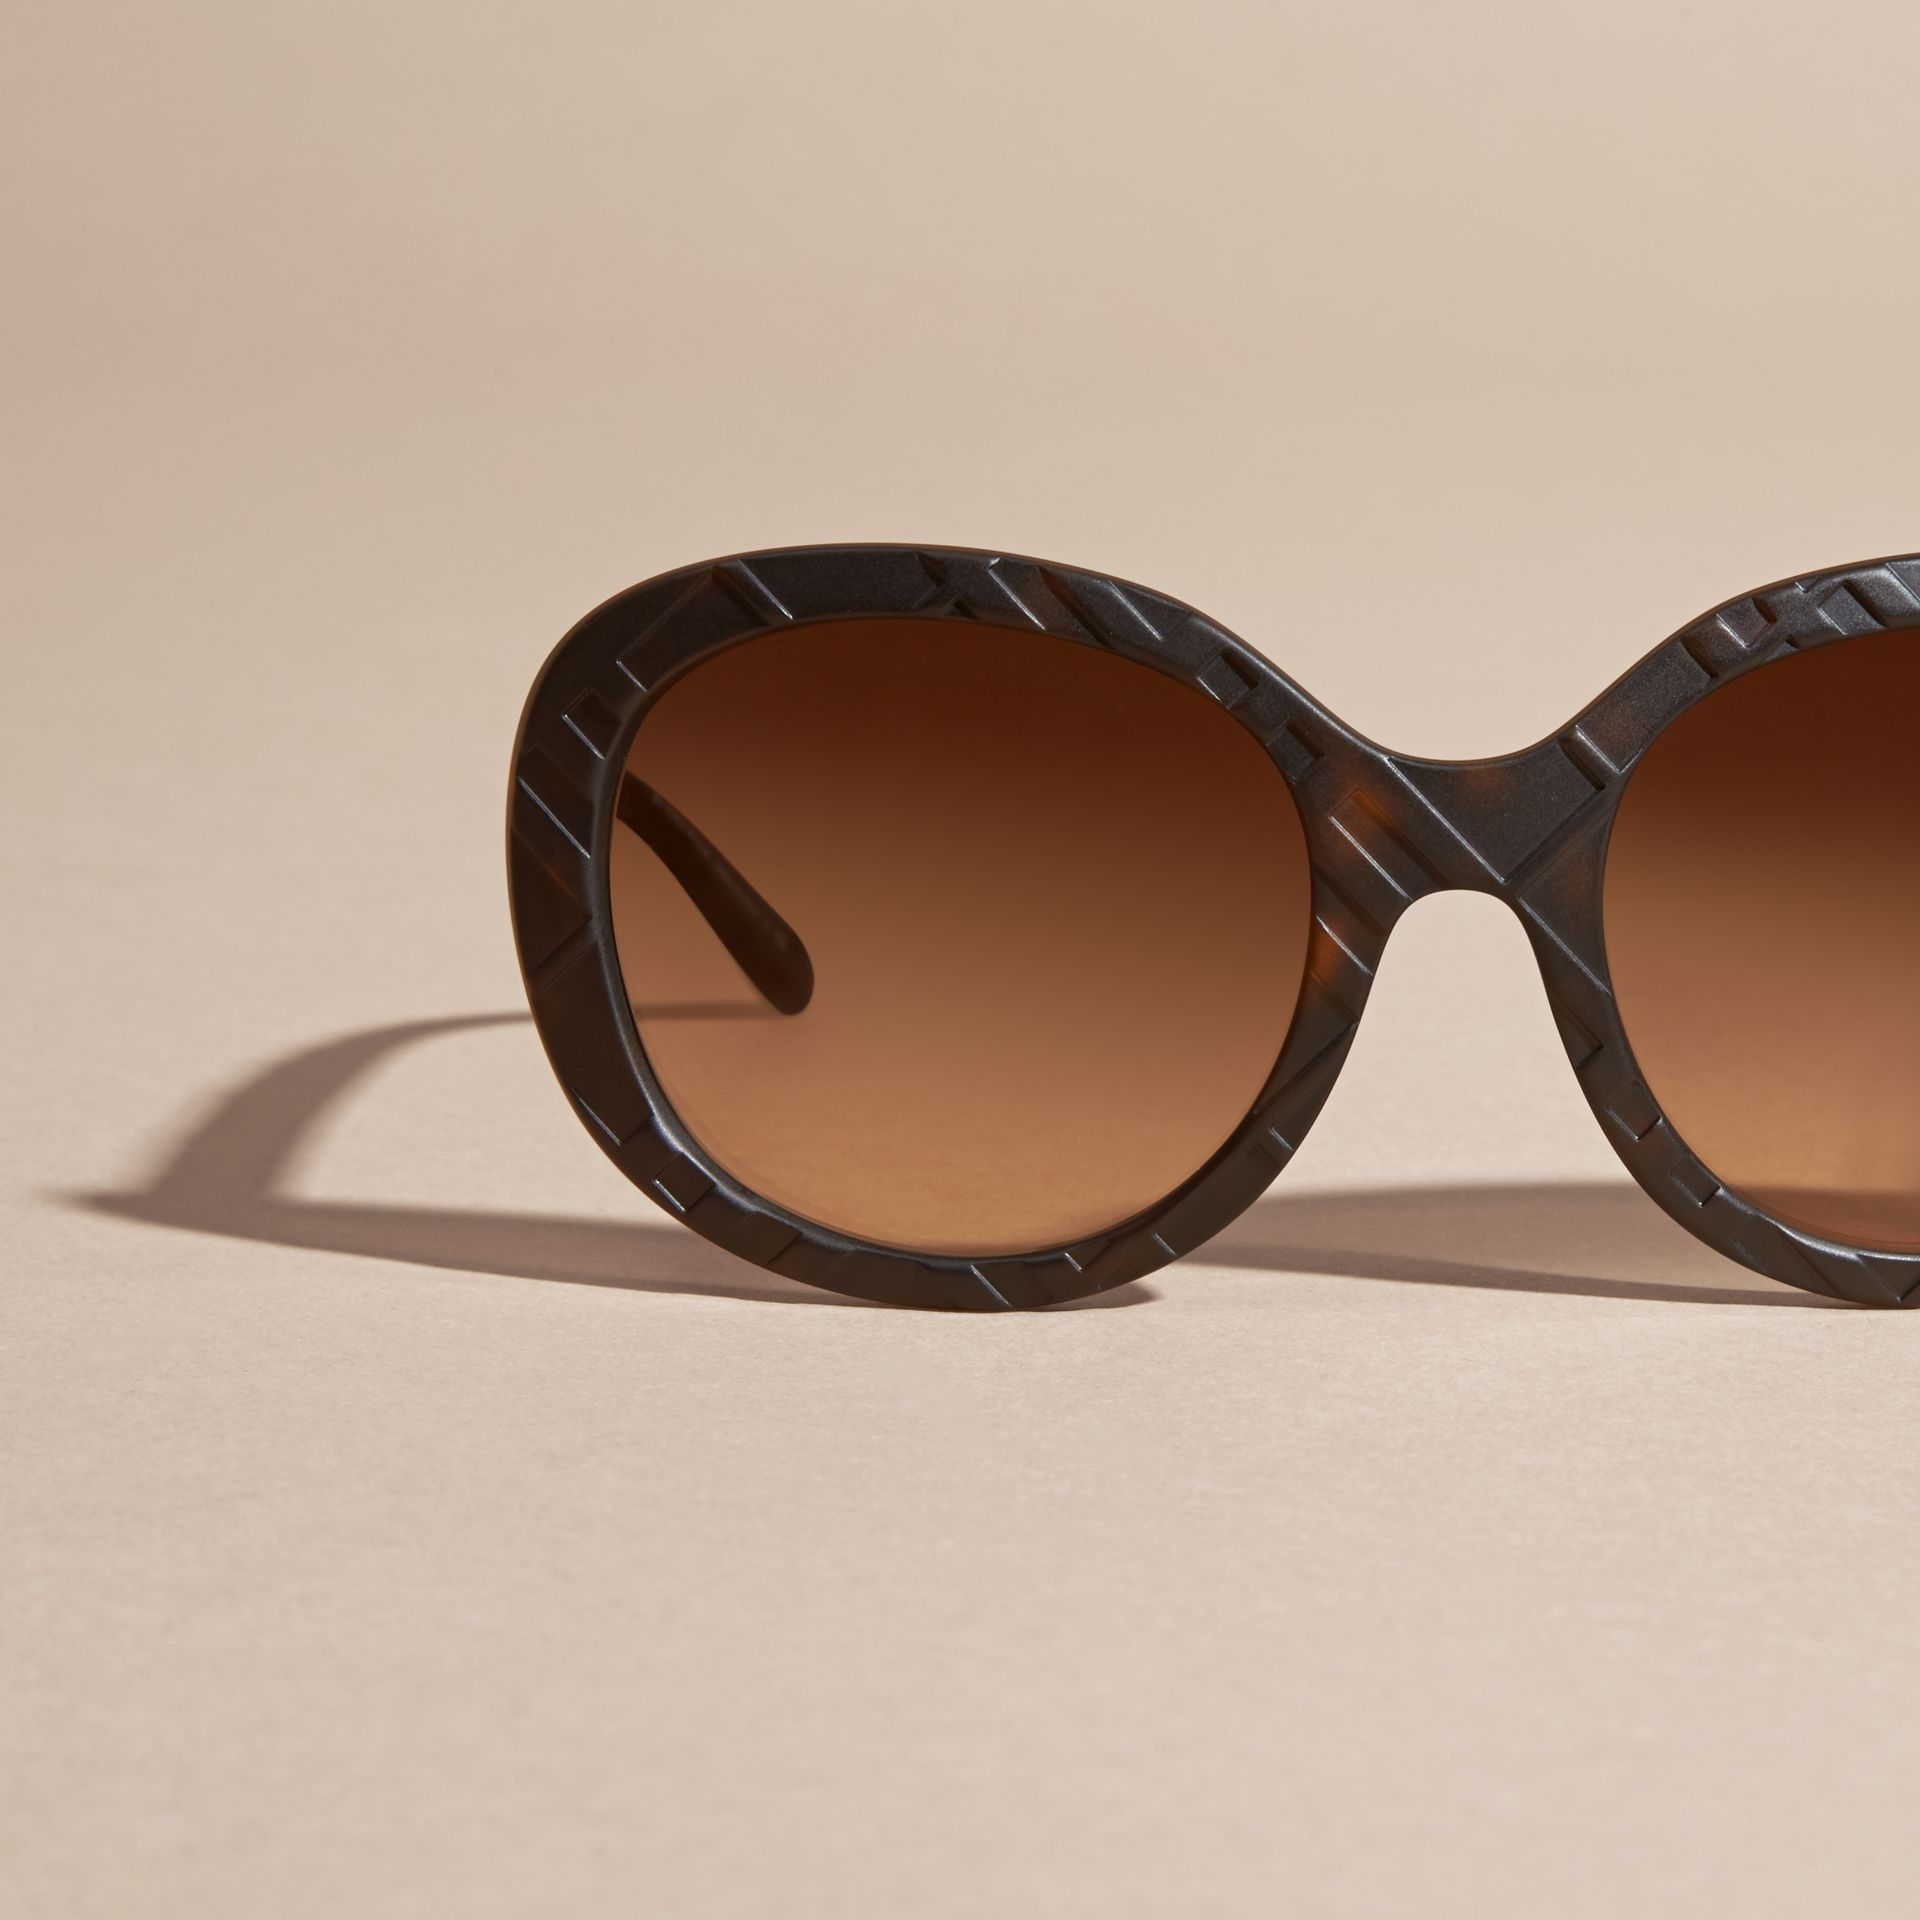 Tortoise shell 3D Check Round Frame Sunglasses Tortoise Shell - gallery image 3